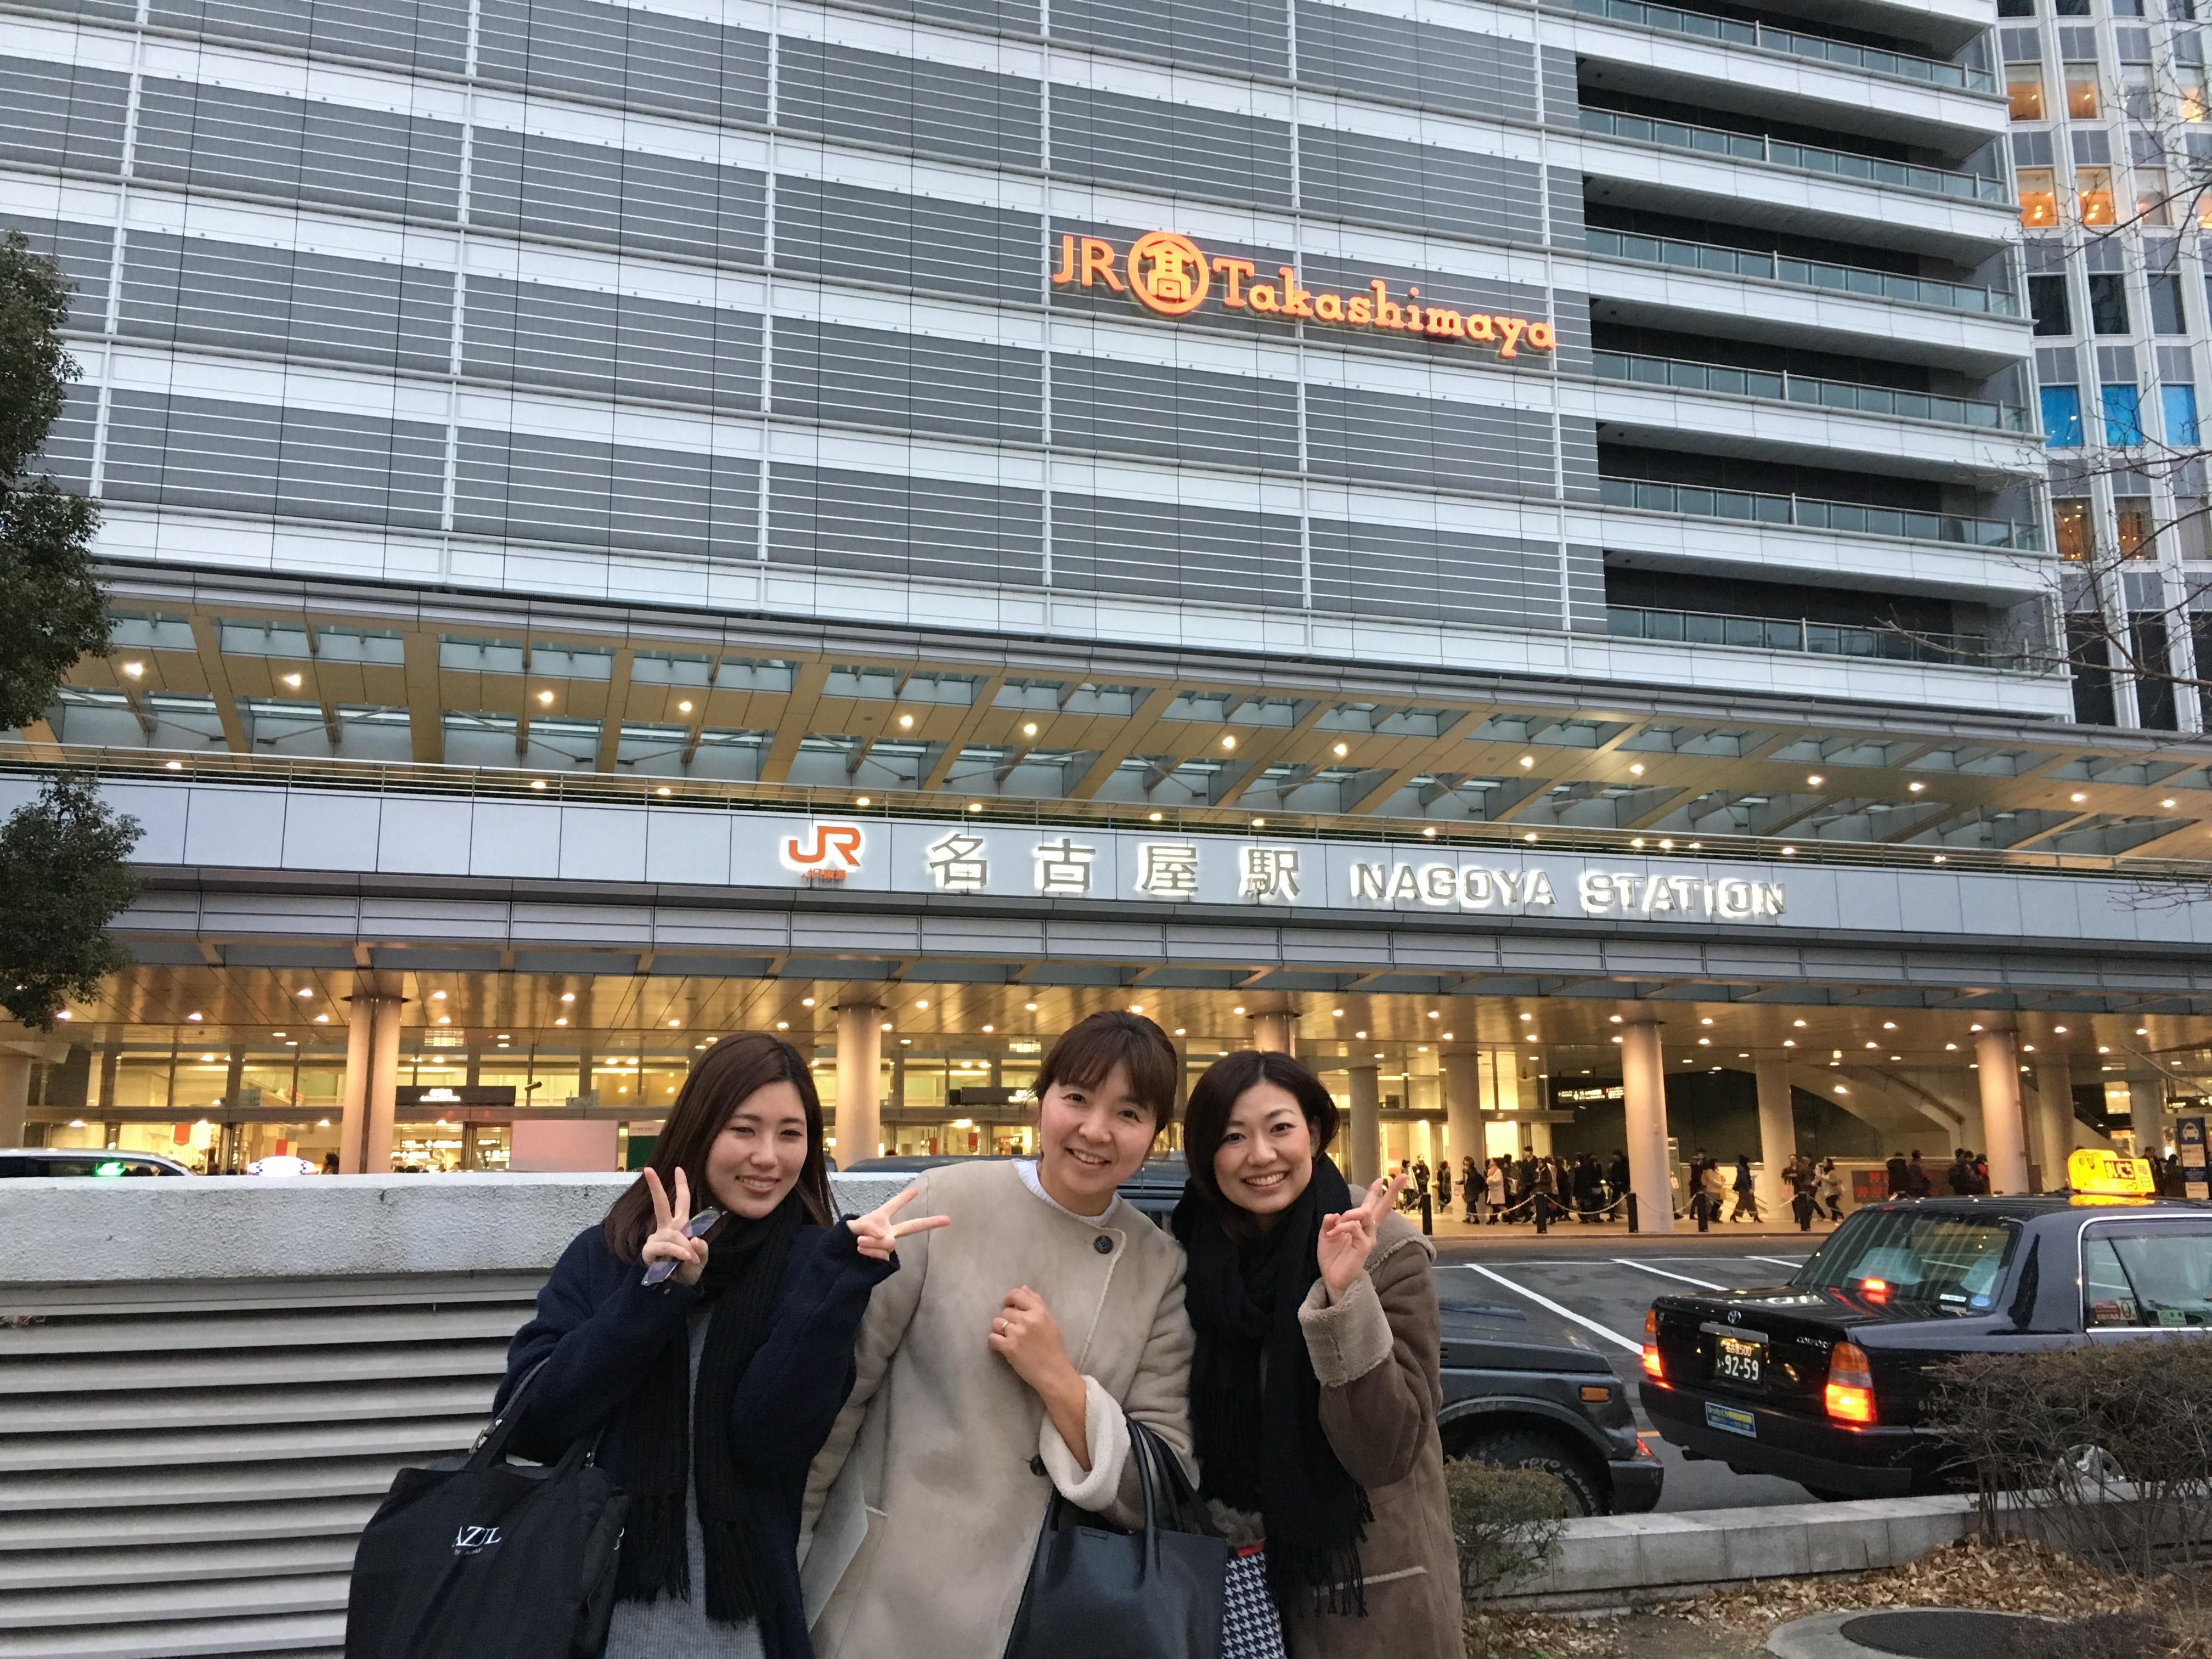 http://www.kunitachi-kodomo.com/blog/staff/images/IMG_6766.JPG